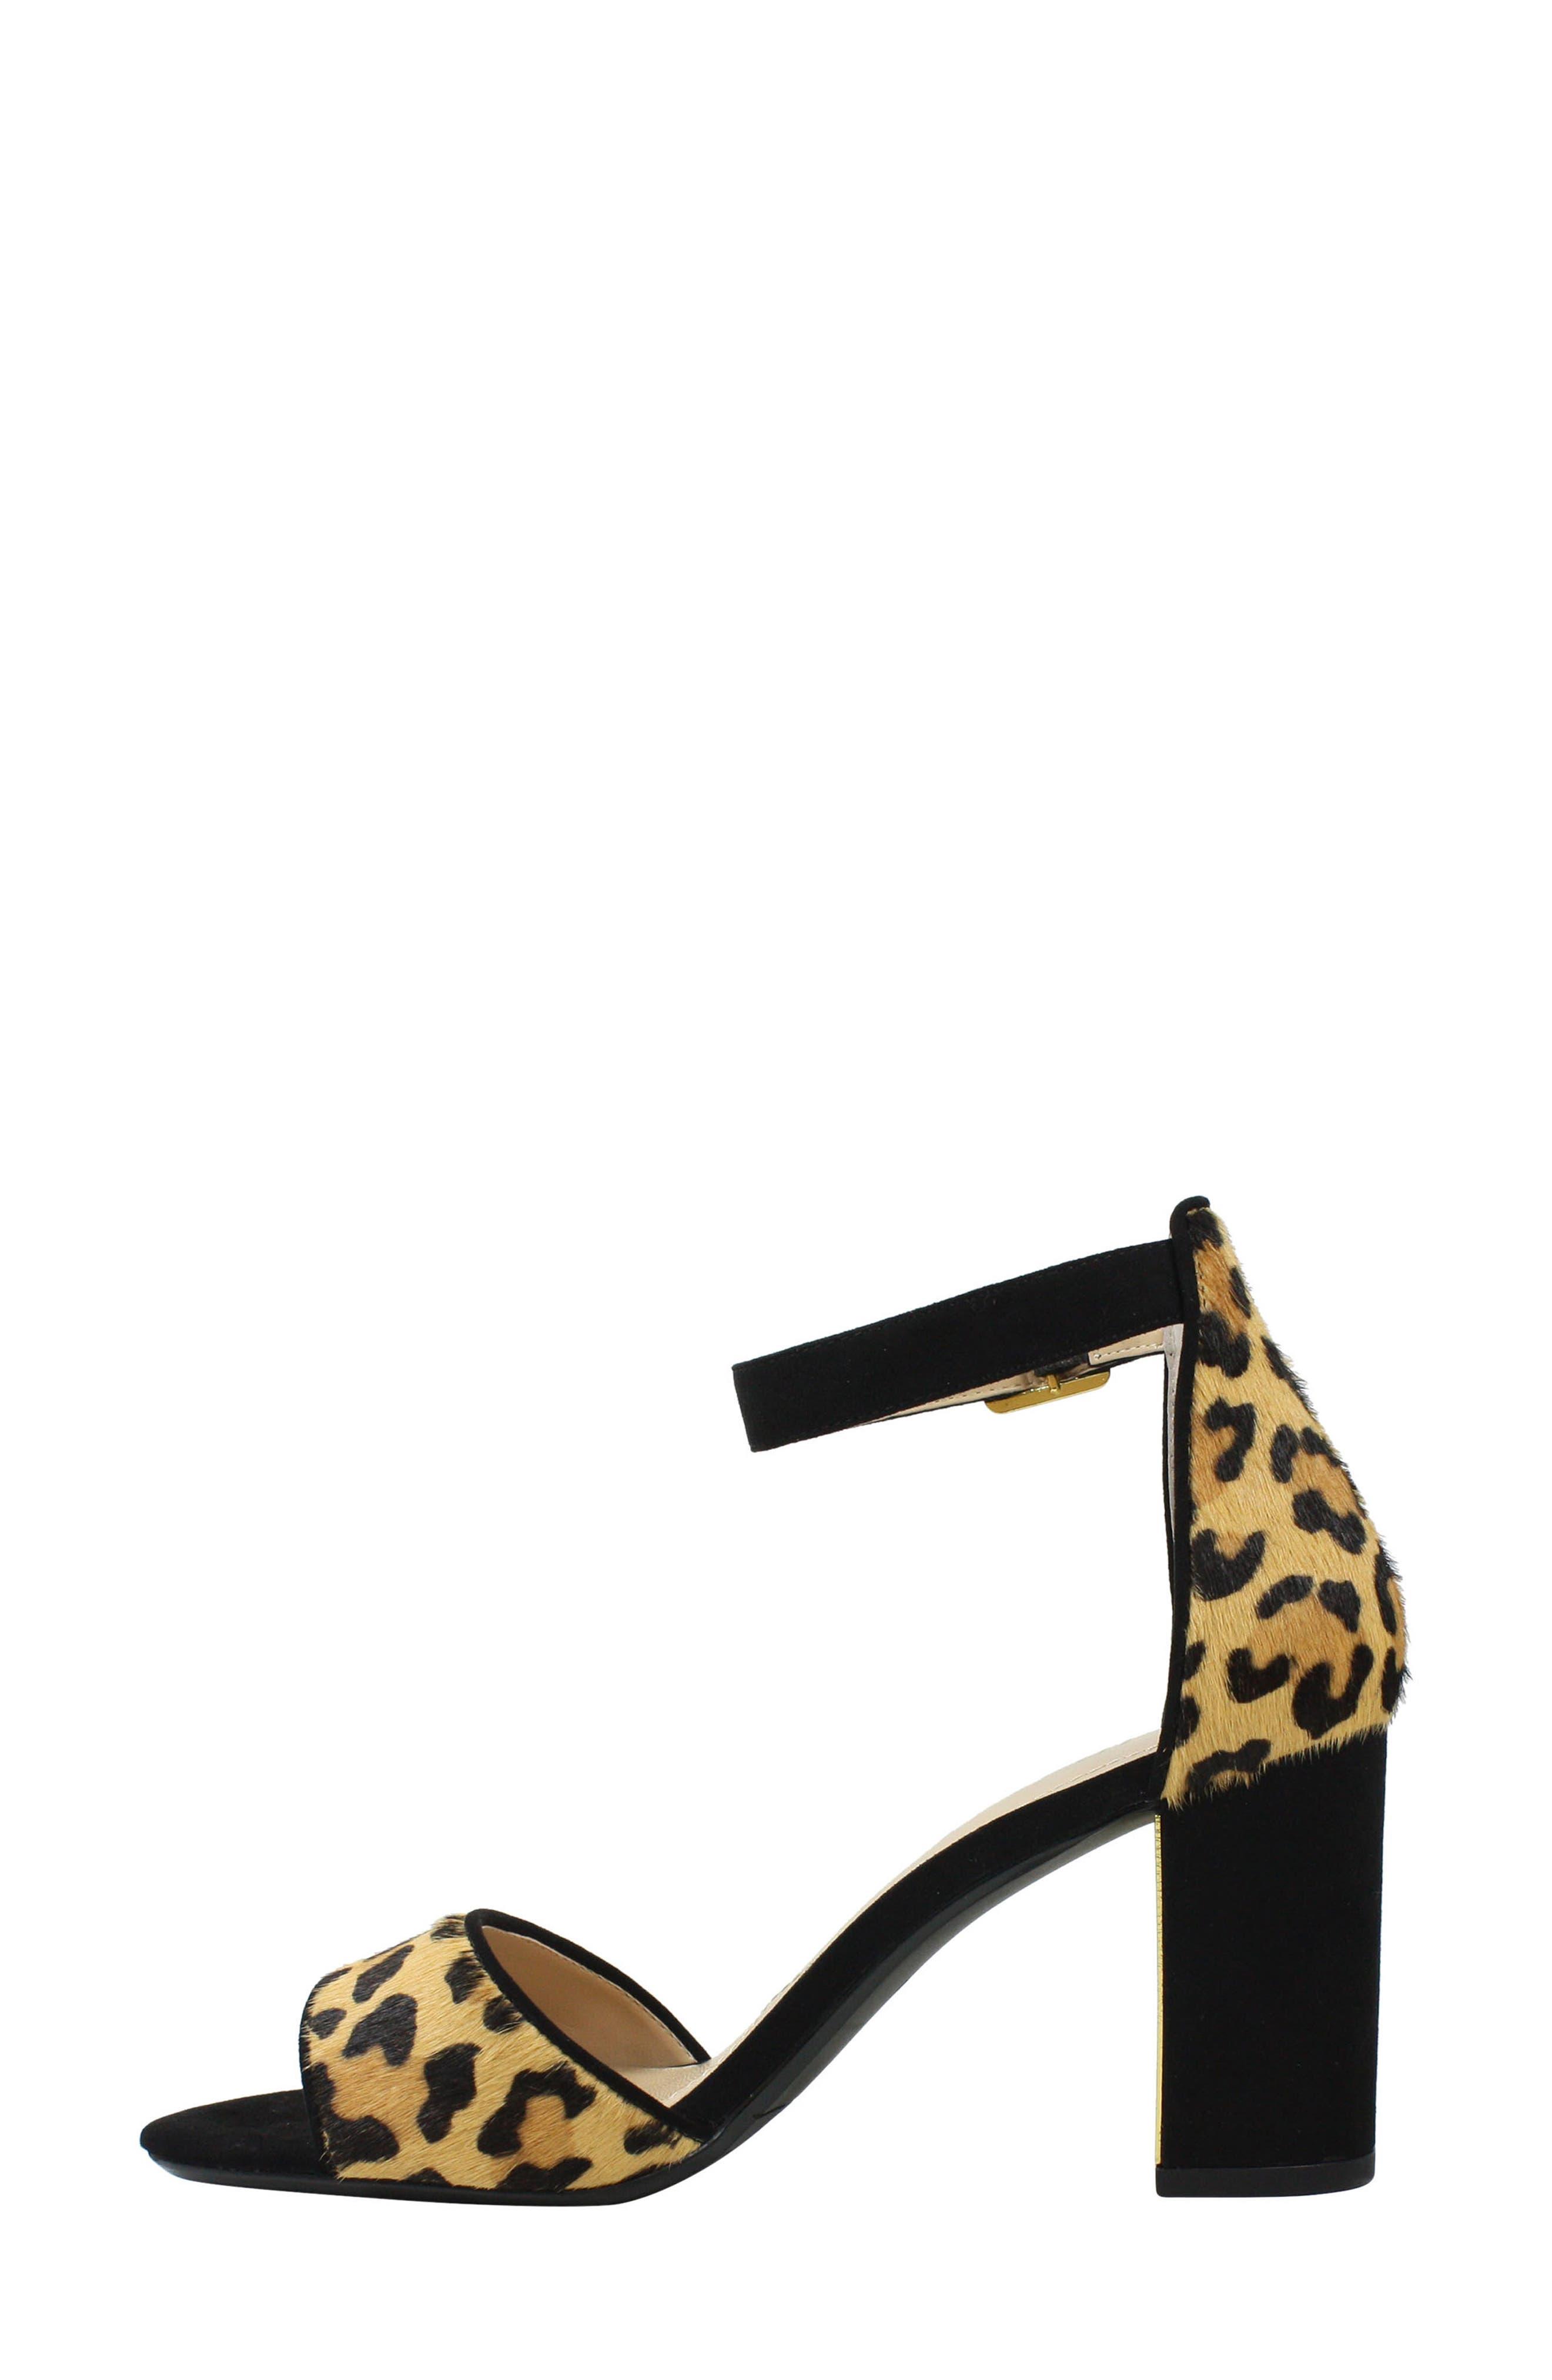 J. RENEÉ, Flaviana Ankle Strap Sandal, Alternate thumbnail 7, color, BLACK/ BROWN CALF HAIR